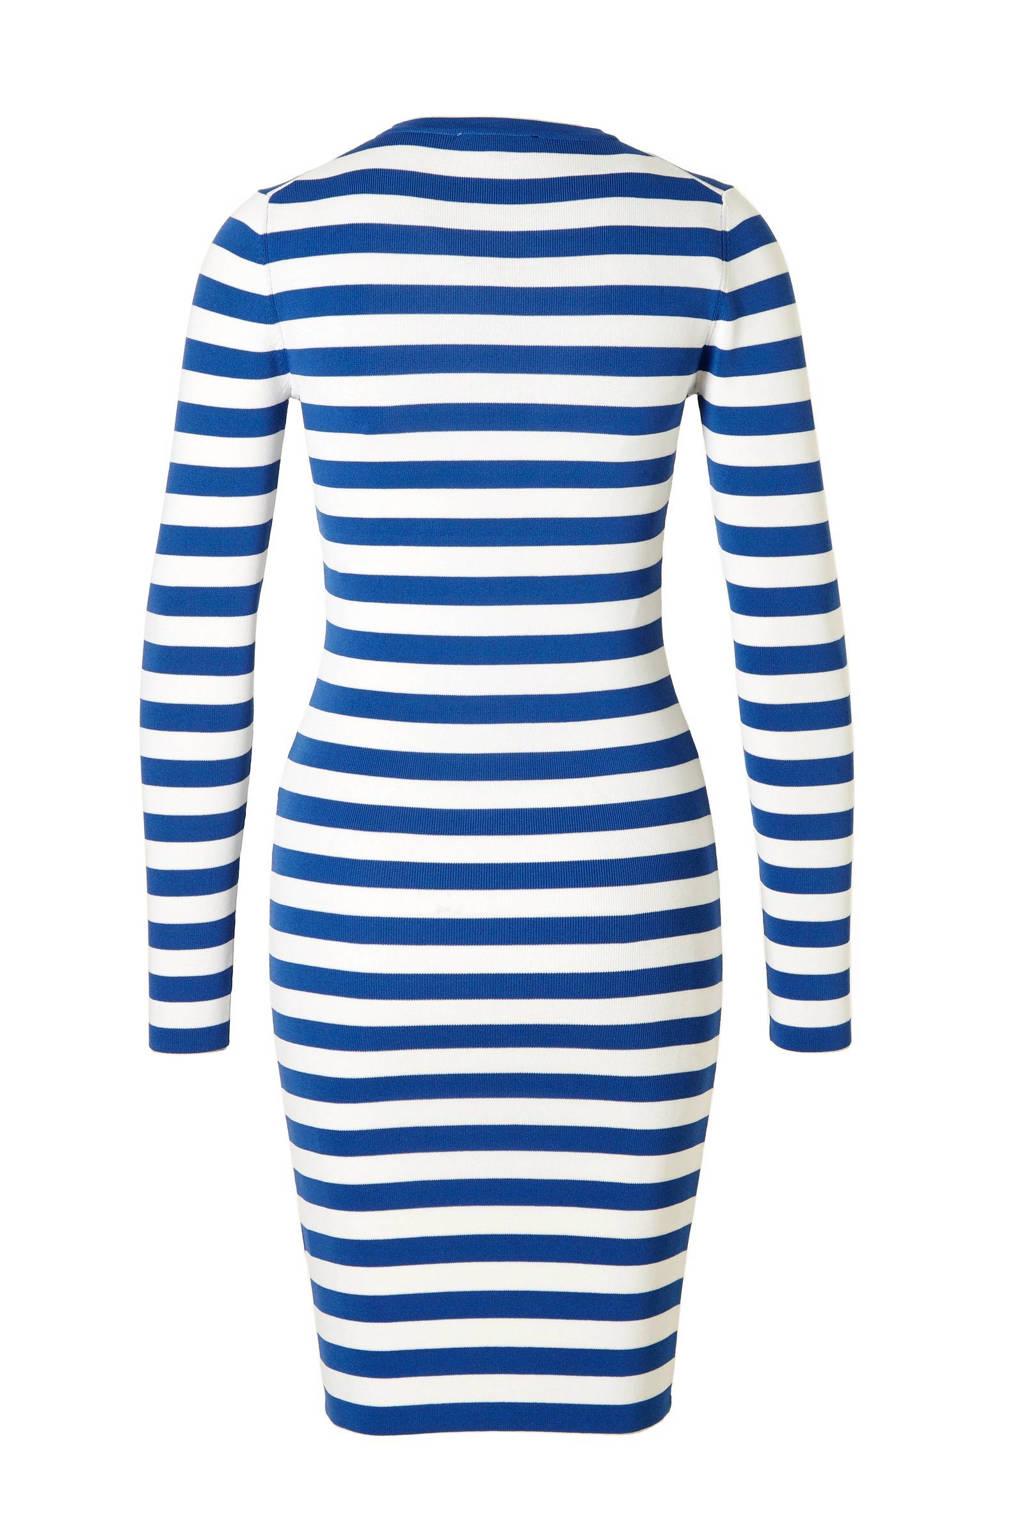 aaa74d85b2c NIKKIE Jolie jurk, Off White/Morning Blue